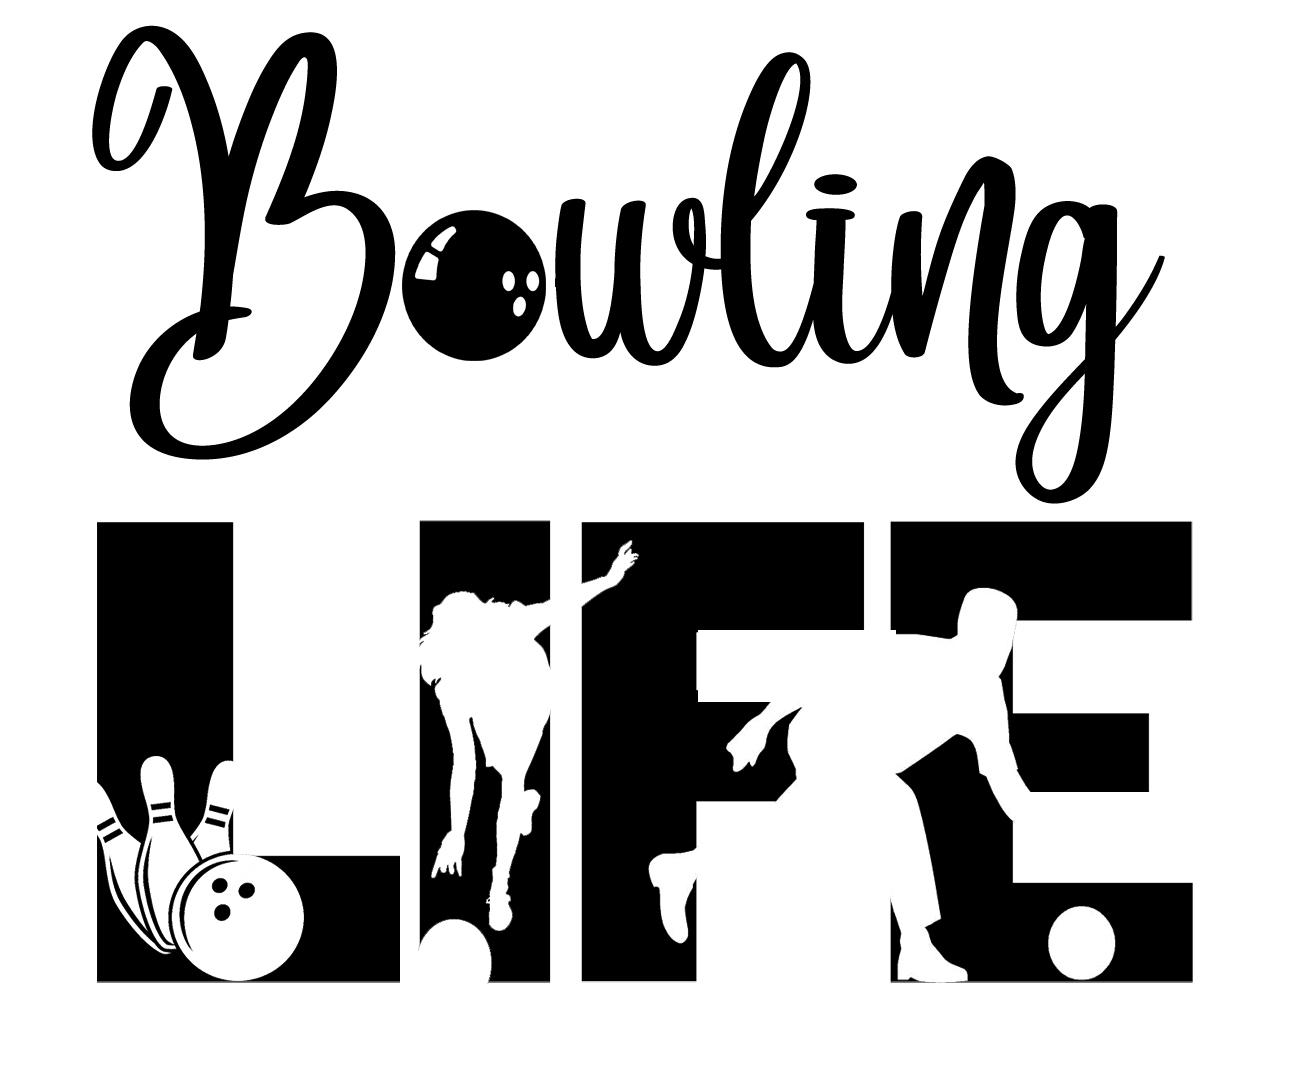 Free Bowling Life SVG File